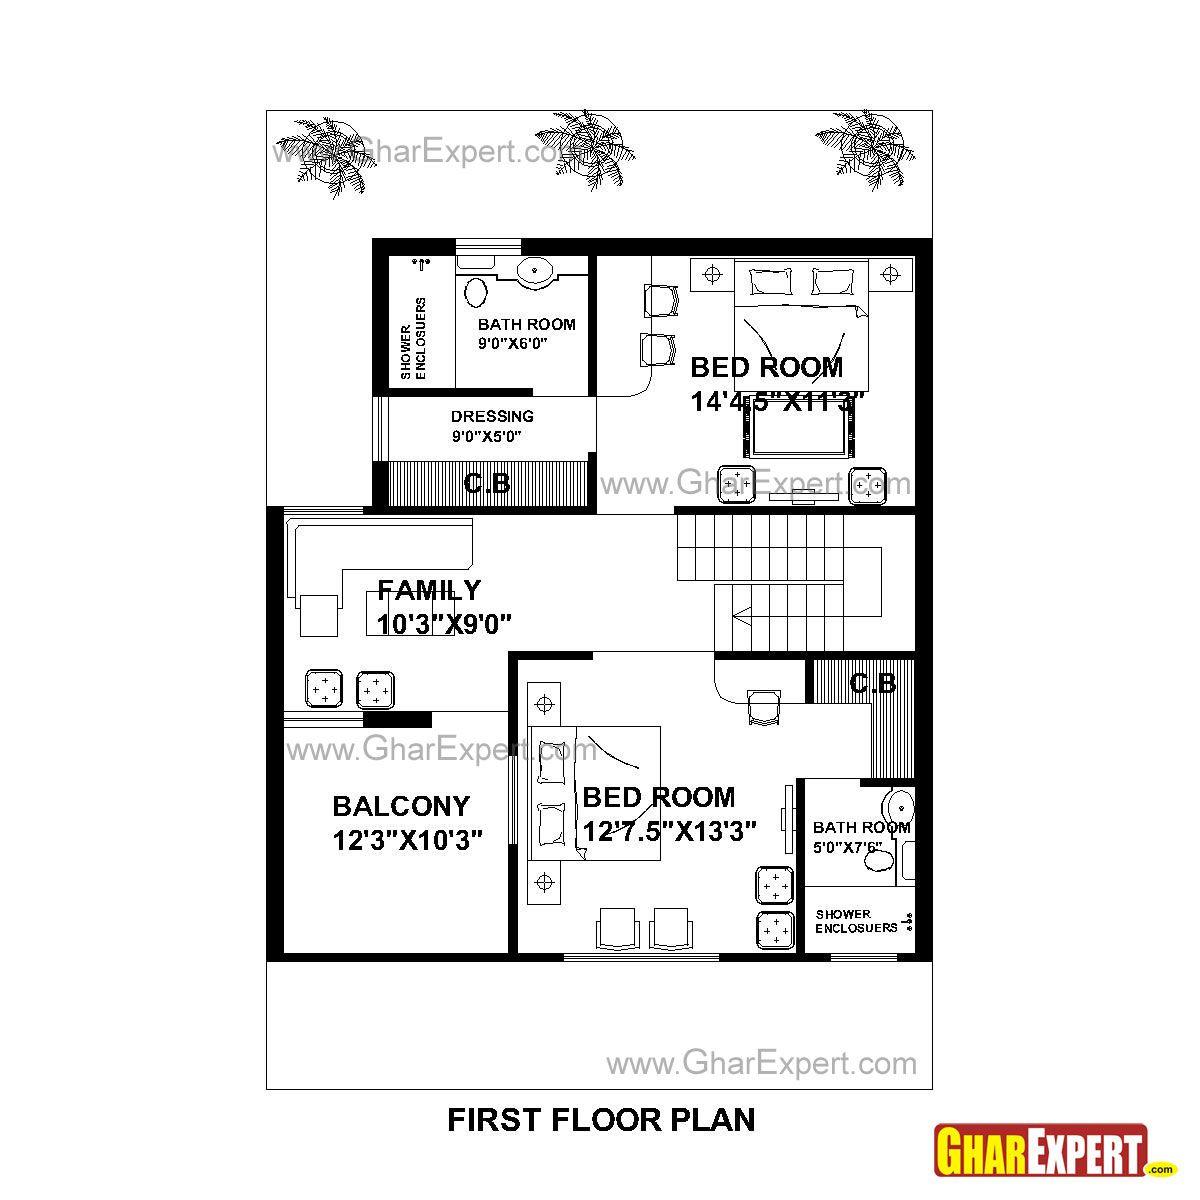 House Plan For 25 Feet By 30 Feet Plot Plot Size 83: House Plan For 30 Feet By 44 Feet Plot (Plot Size 147